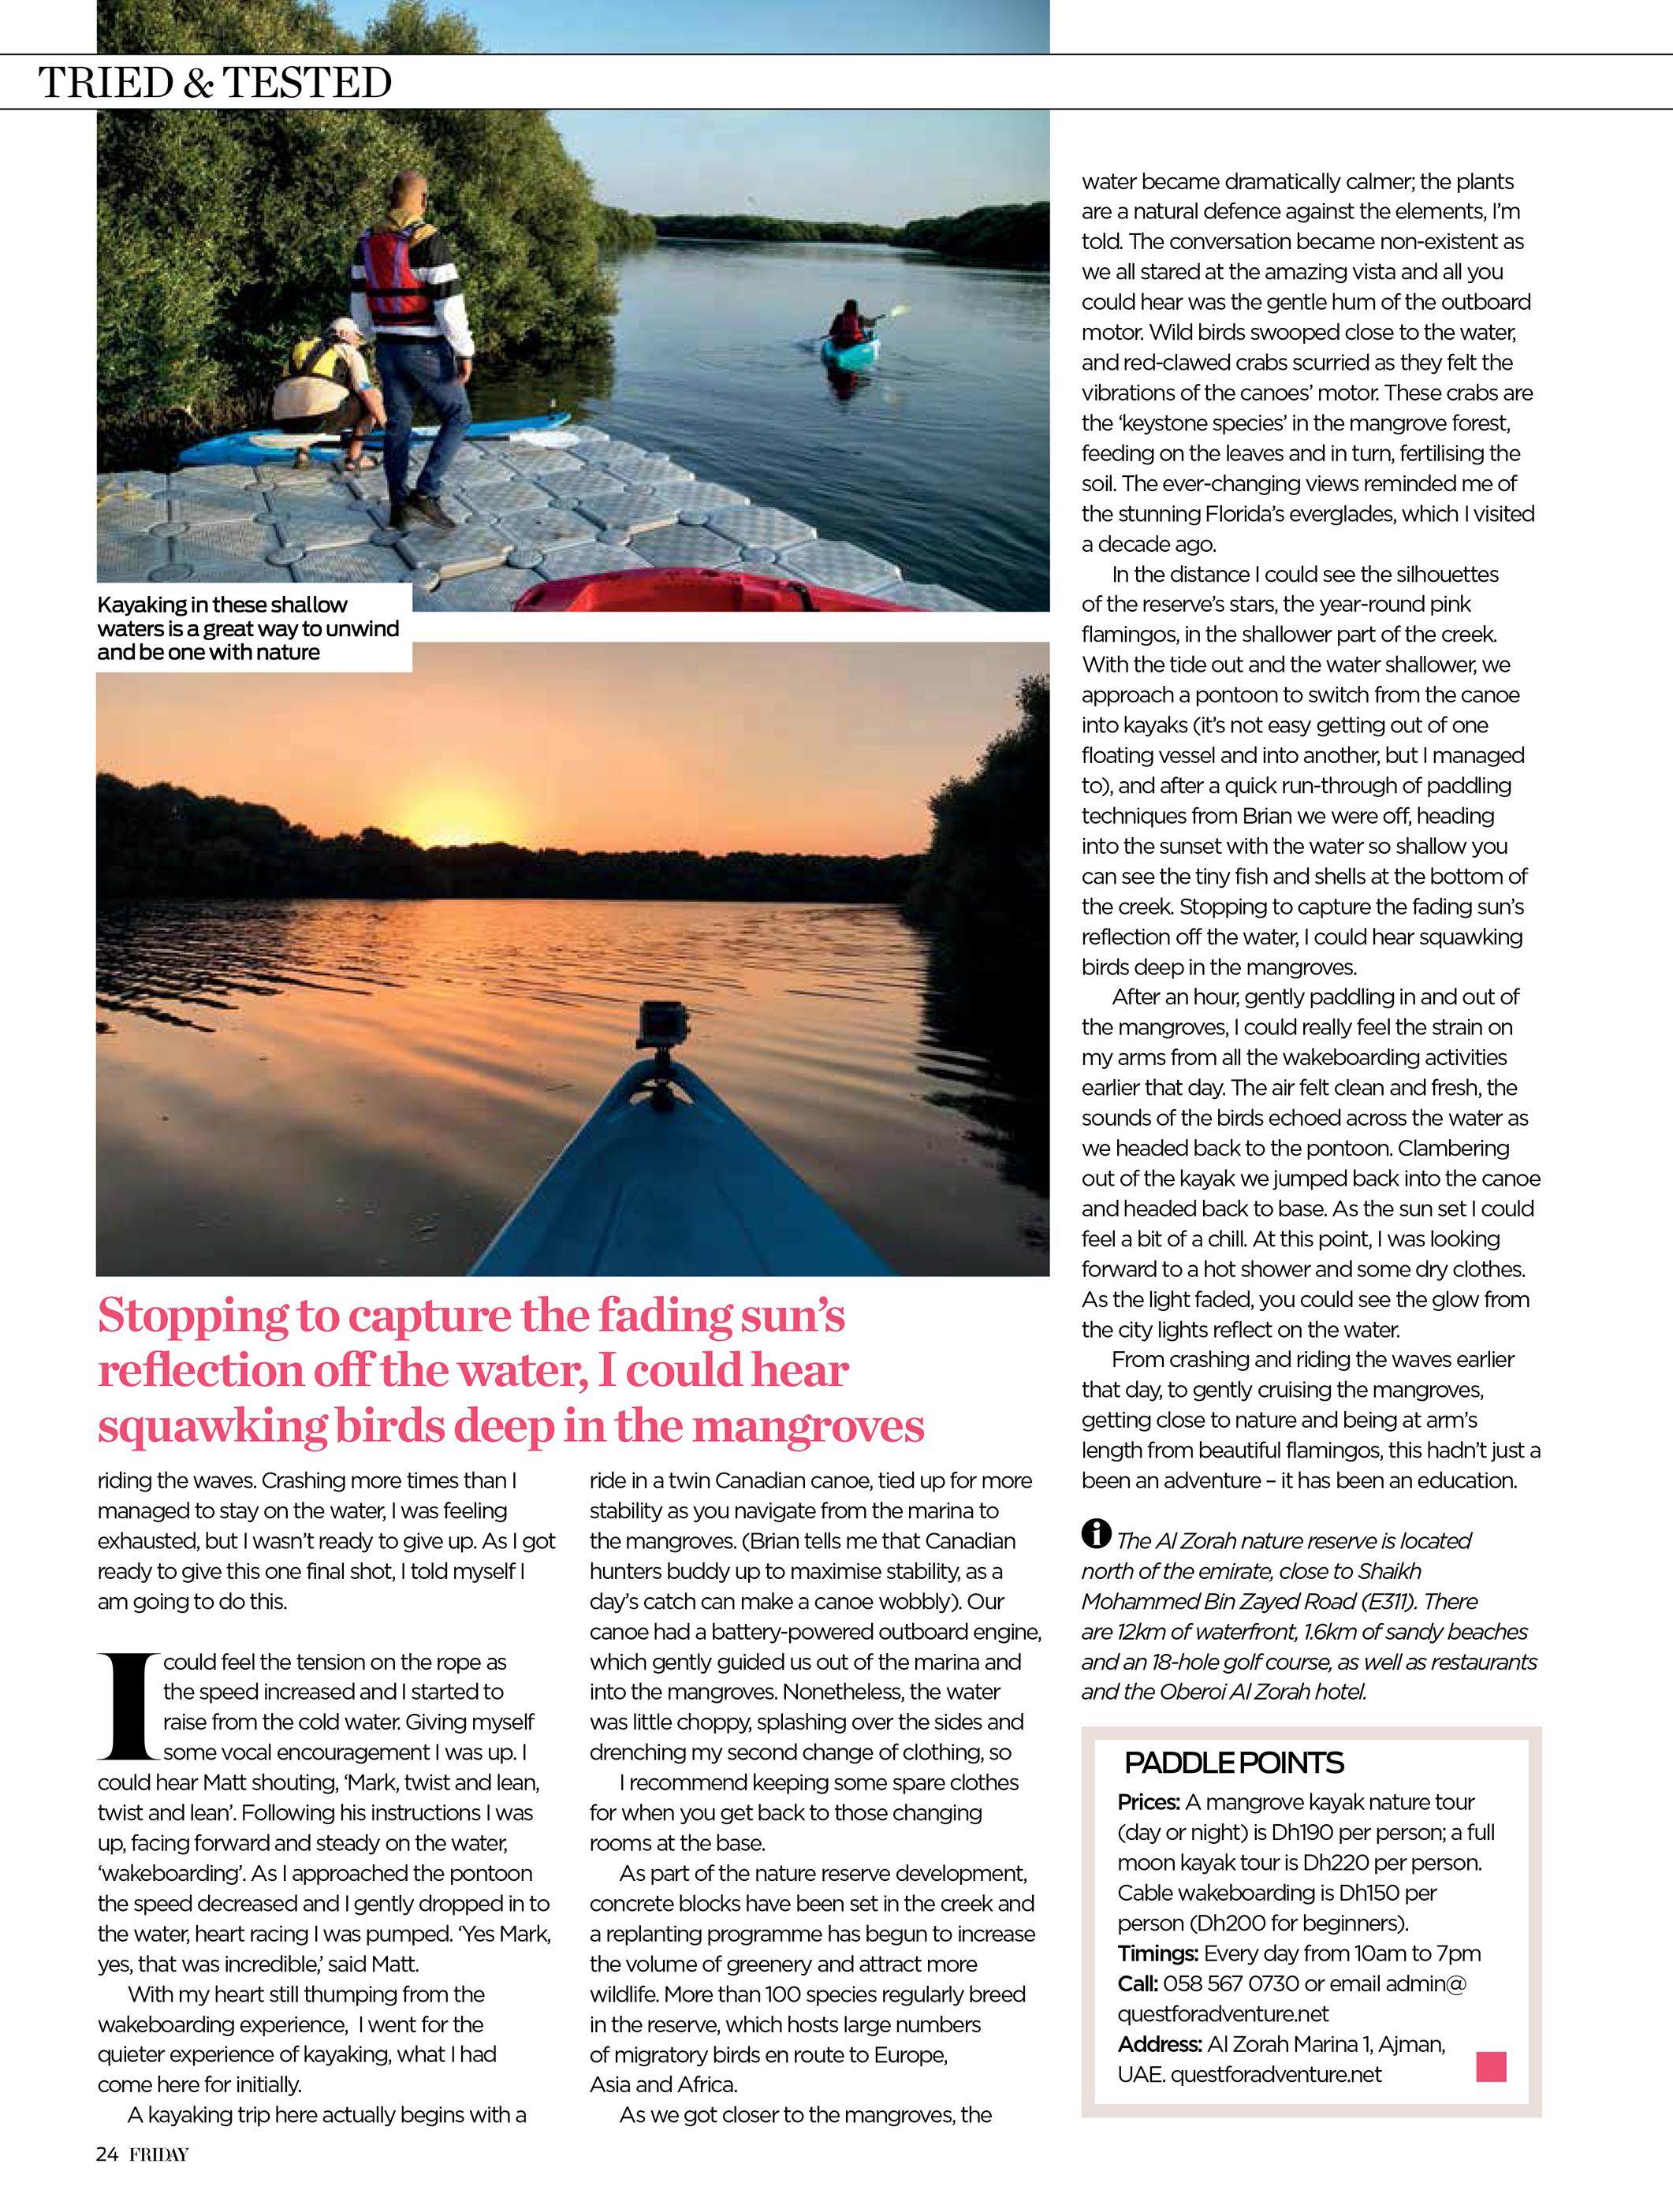 Friday Magazine, Gulf News, UAE